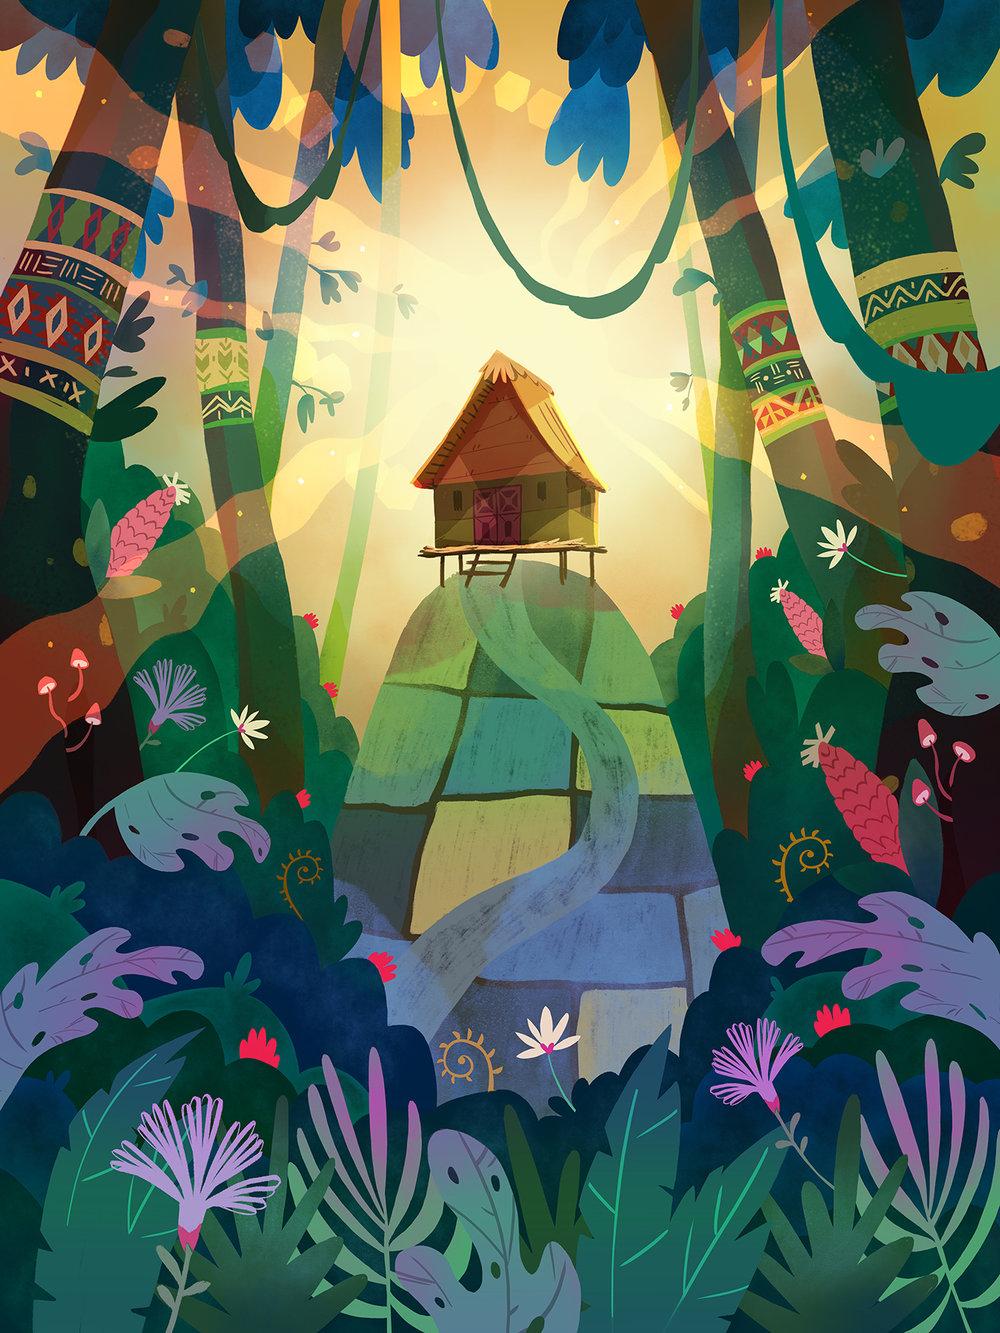 Sweet Home in Jungle by Èlia Meraki  ©